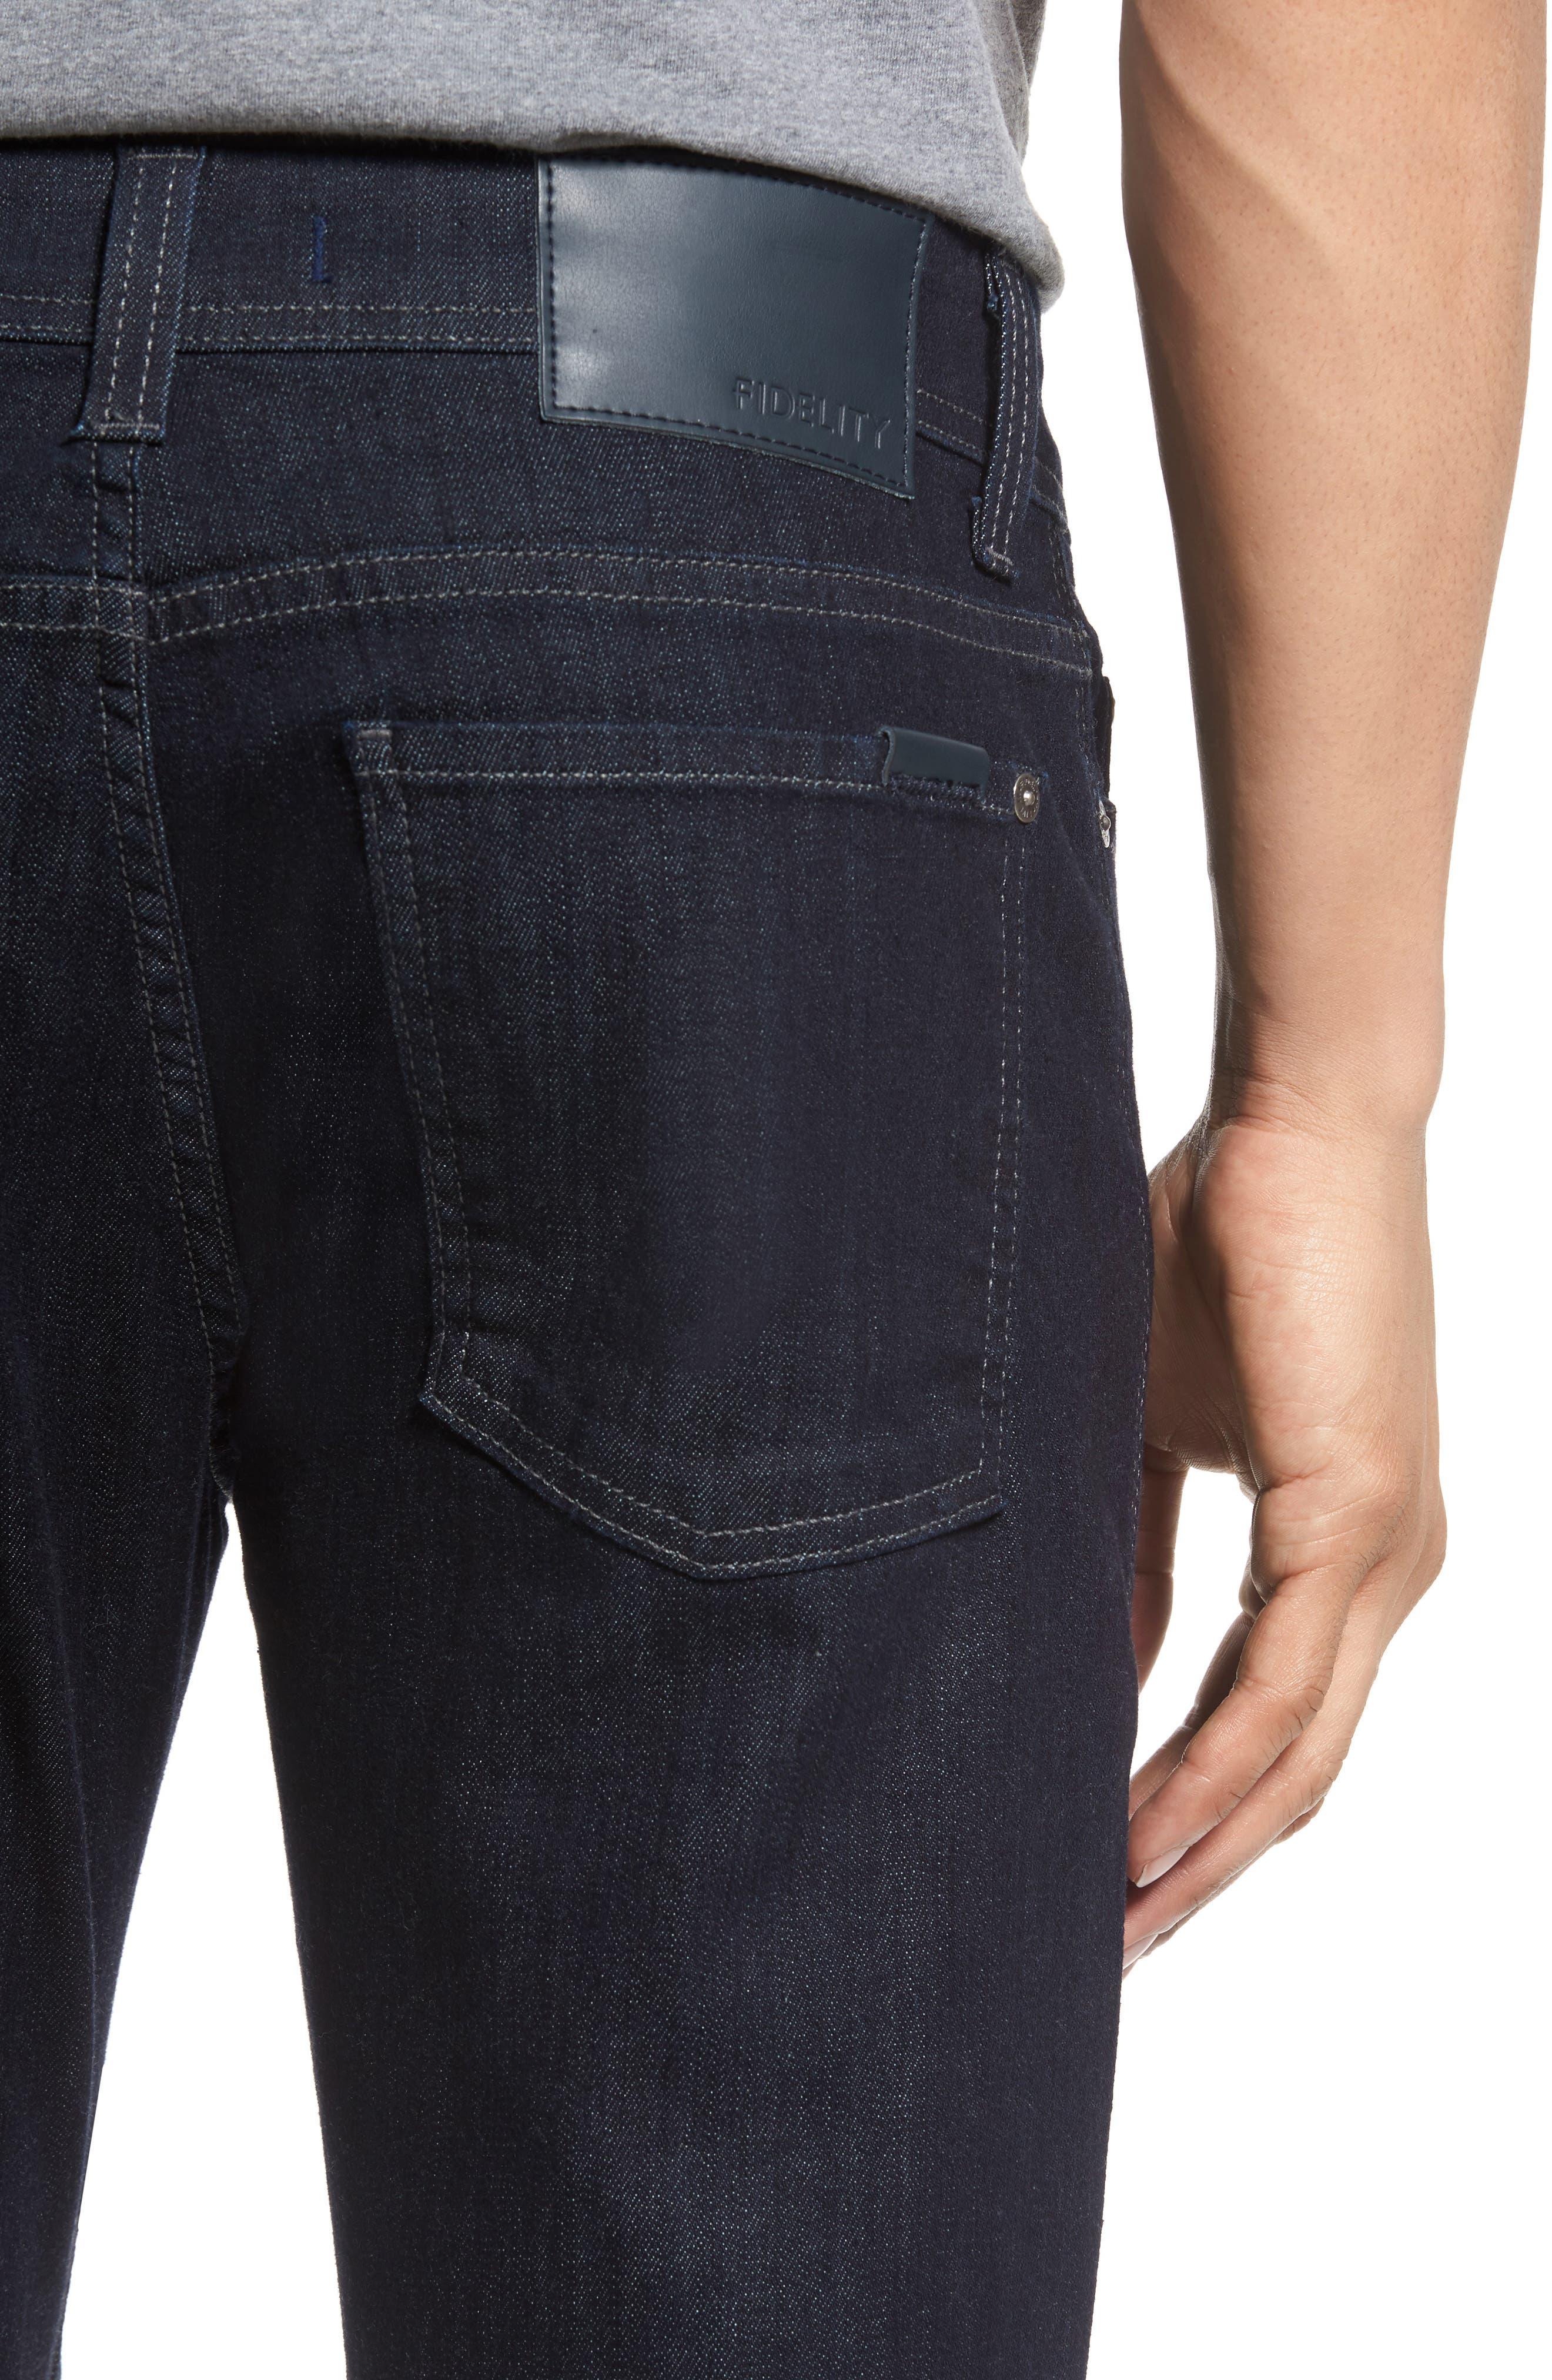 Torino Slim Fit Jeans,                             Alternate thumbnail 4, color,                             400